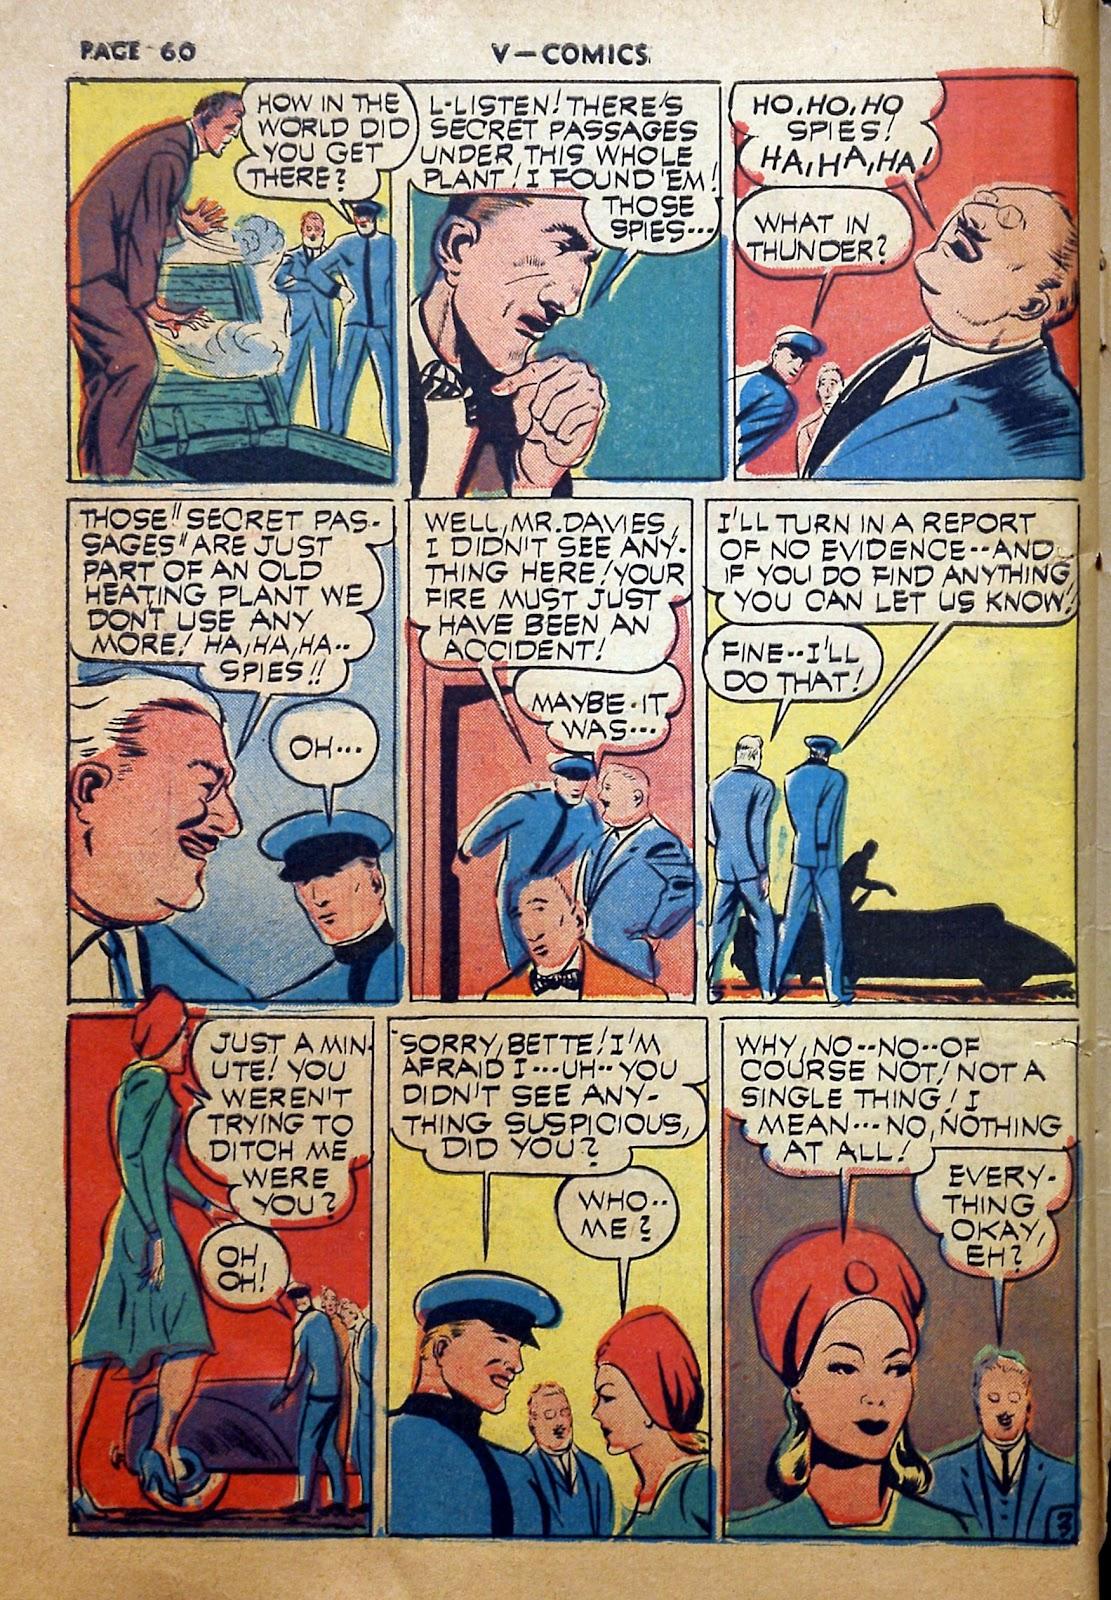 Read online V...- Comics comic -  Issue #2 - 61